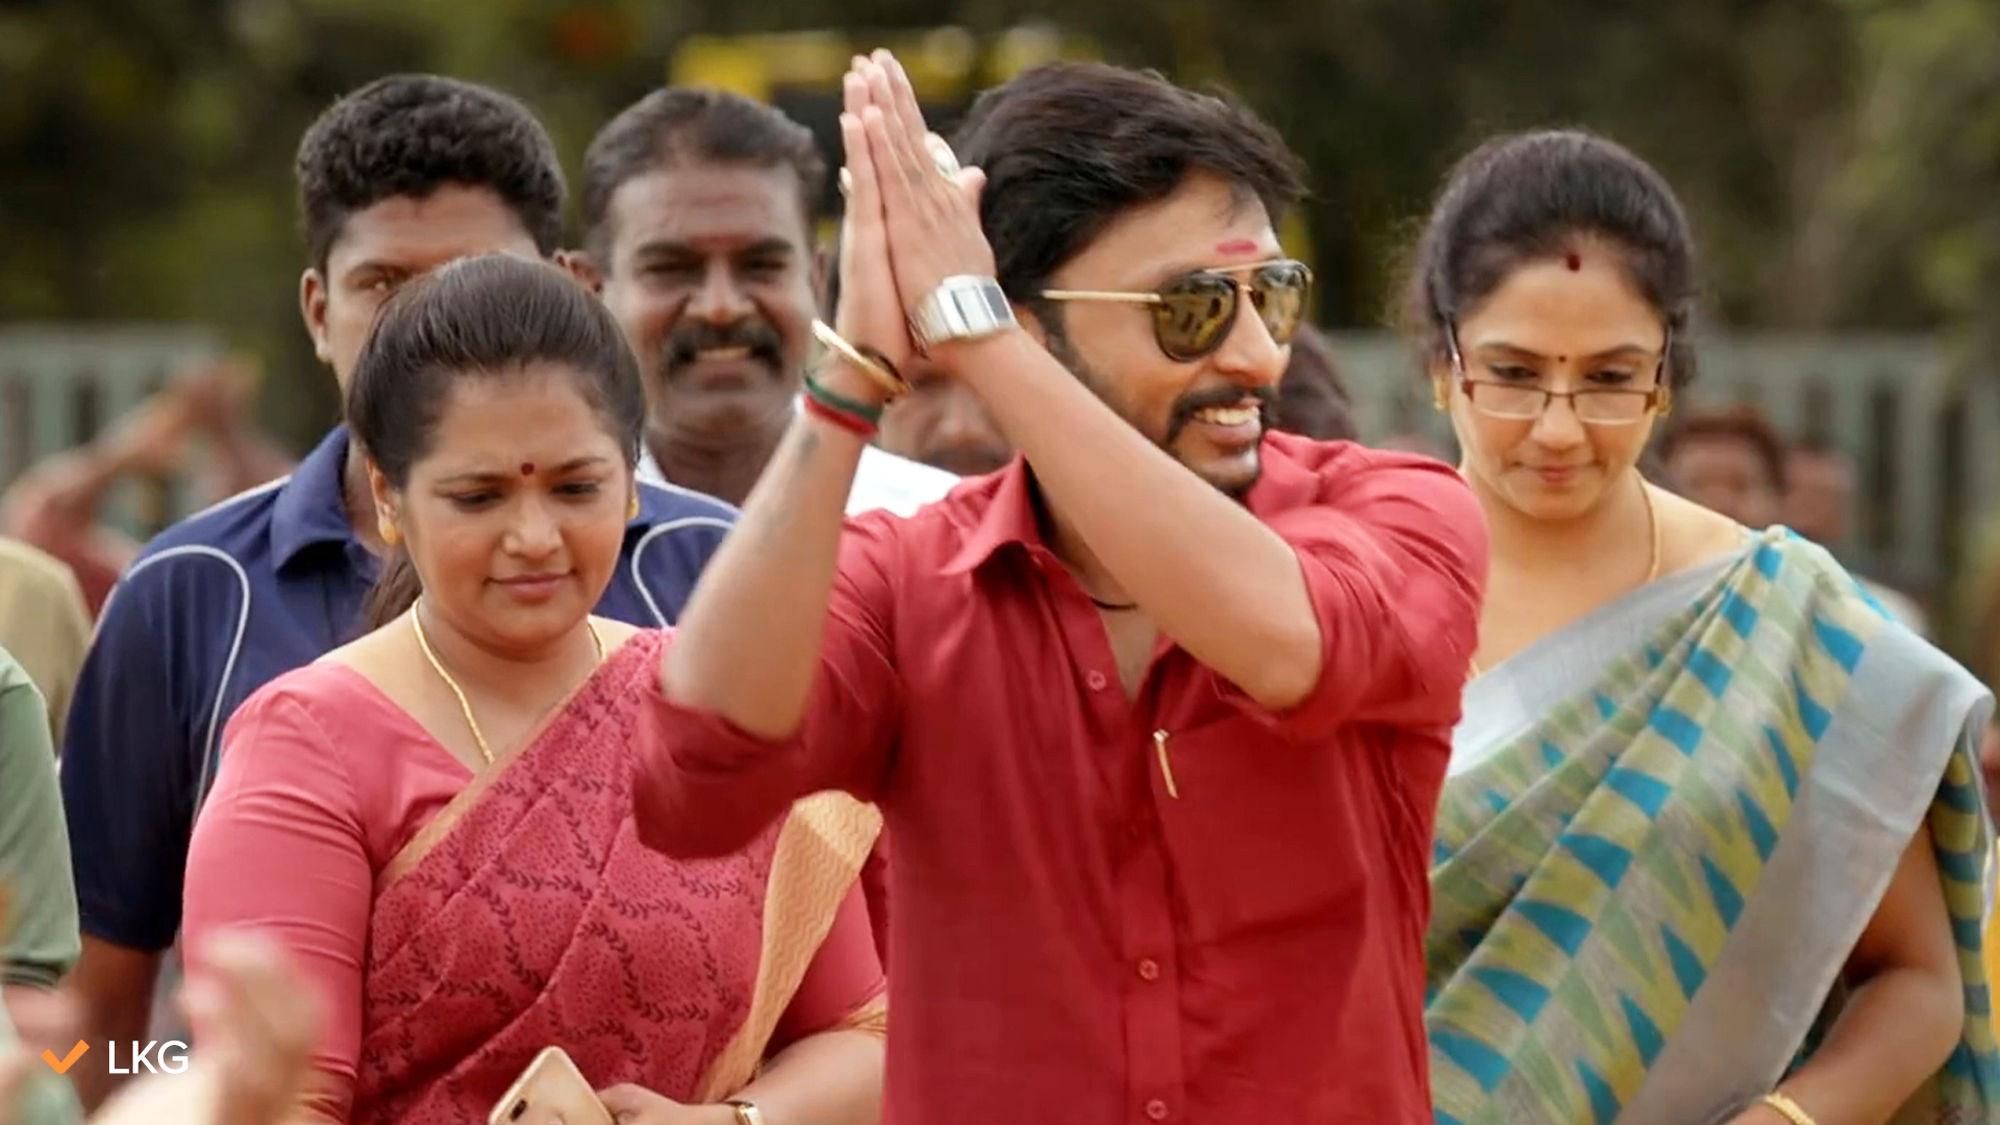 Hero RJ Balaji LKG Telugu Dubbing film on aha ott from June 25